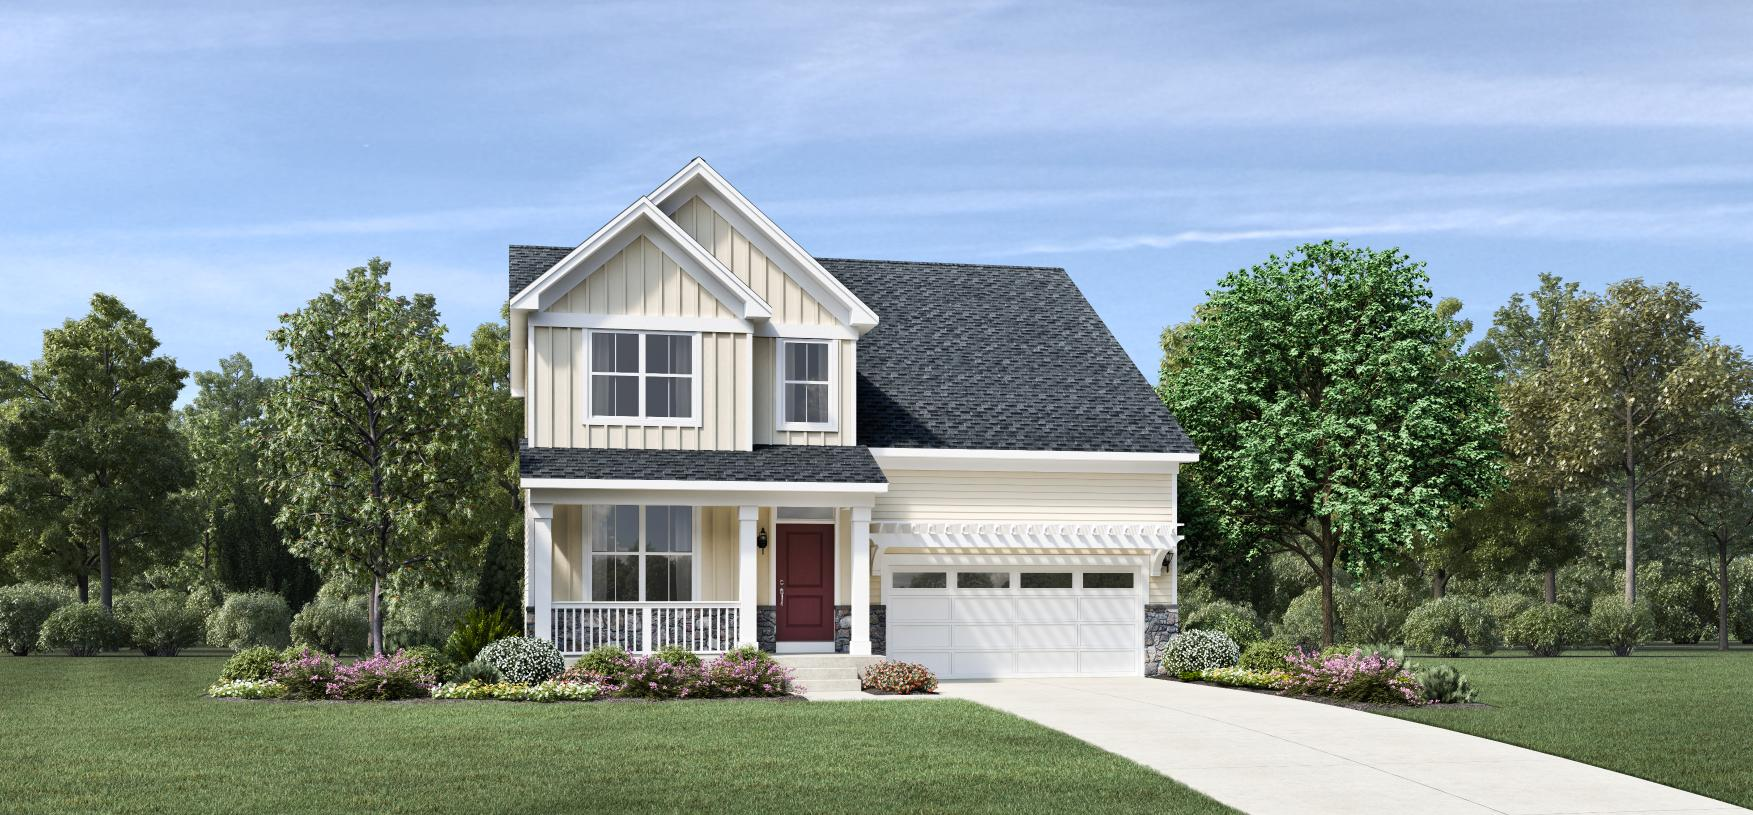 Dunlap - Modern Farmhouse